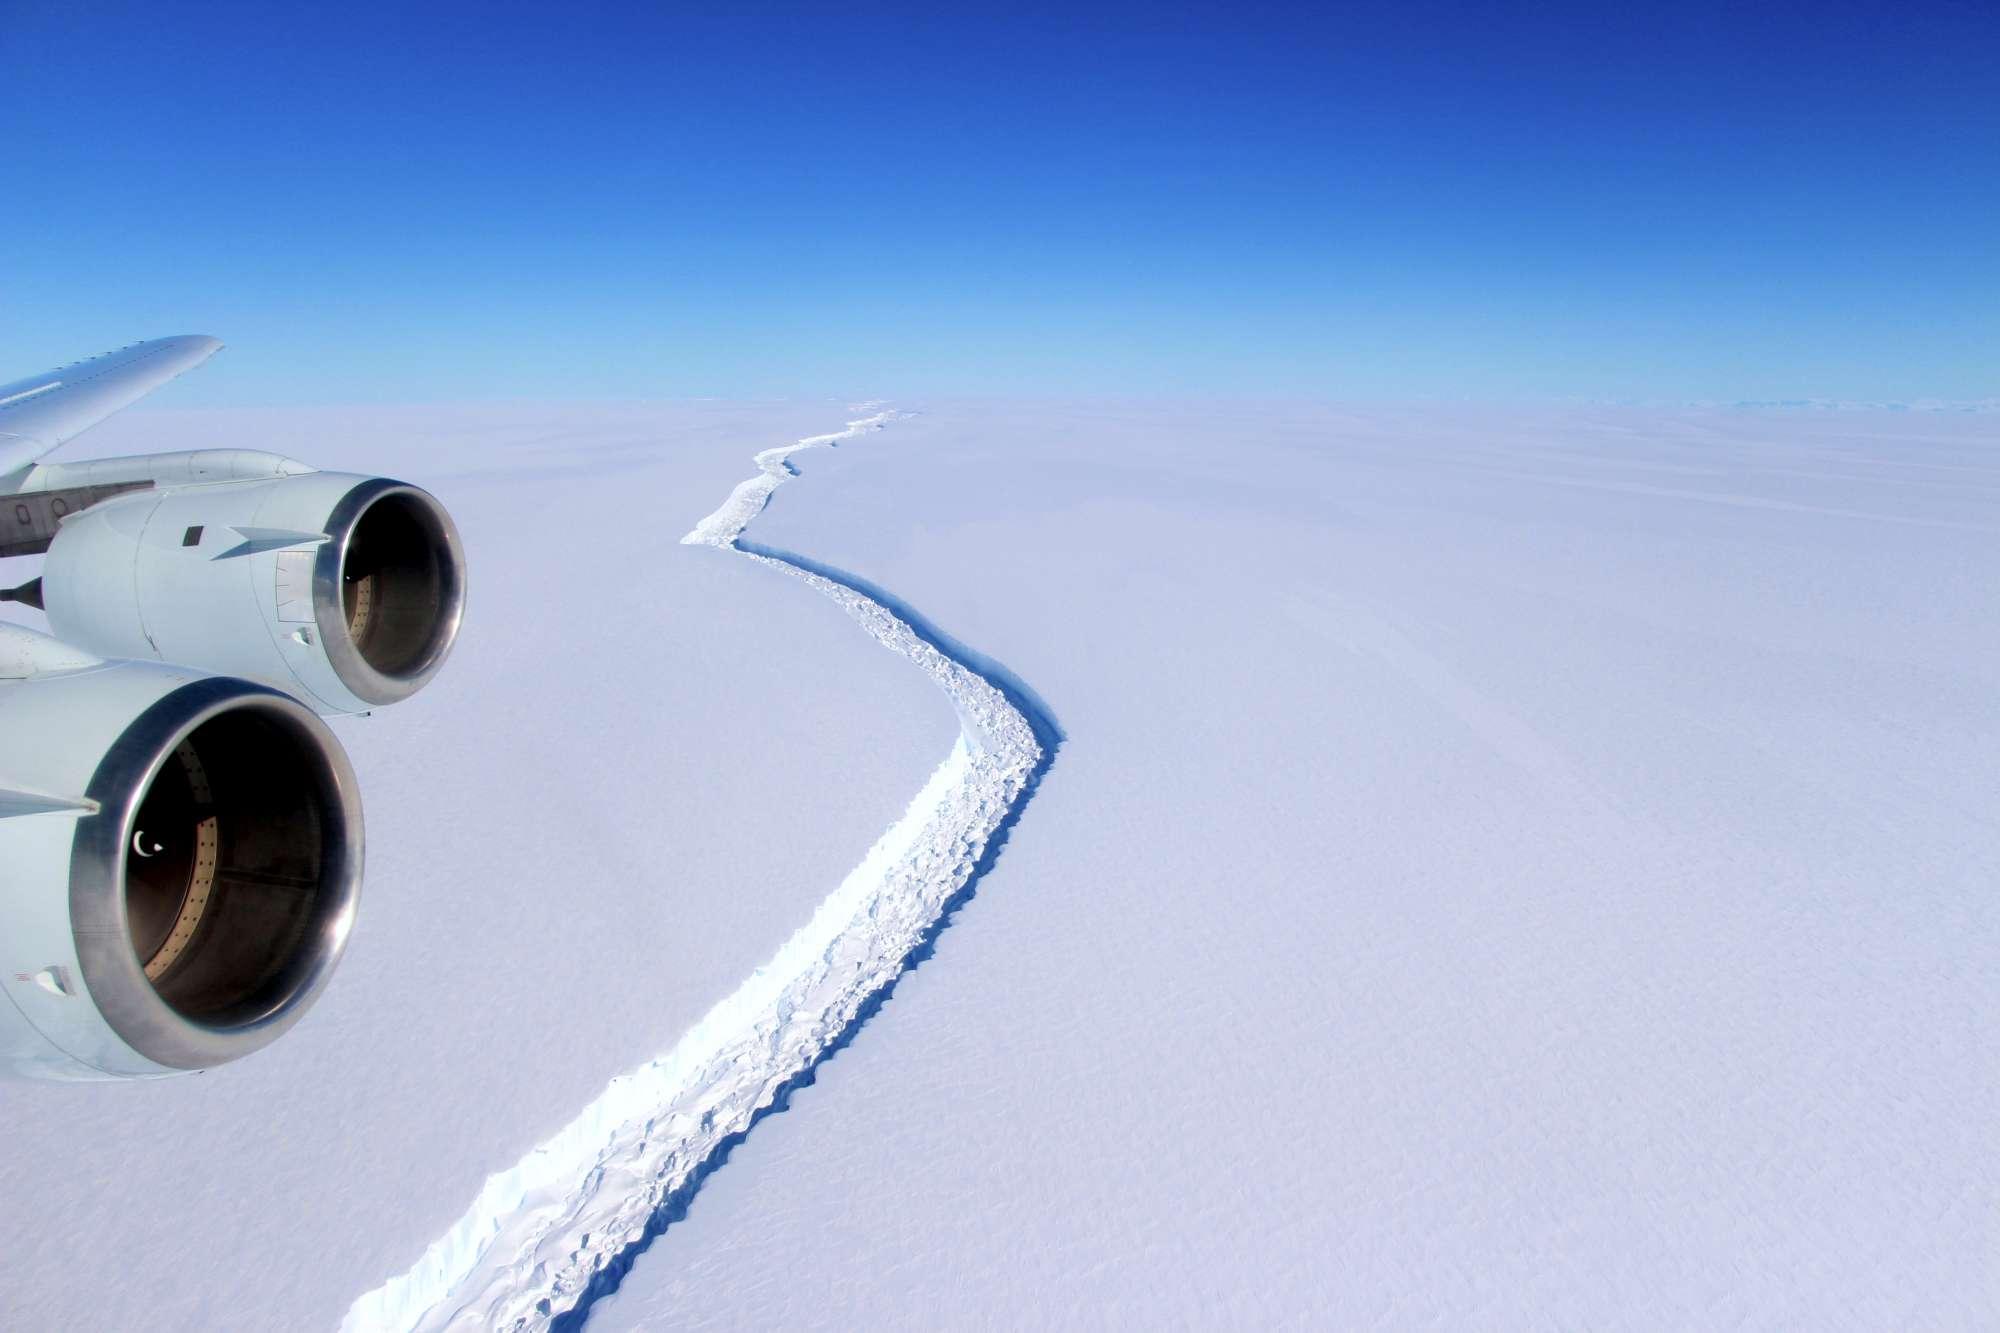 ANTARTIDE: enorme ICEBERG si stacca dalla calotta Larsen C